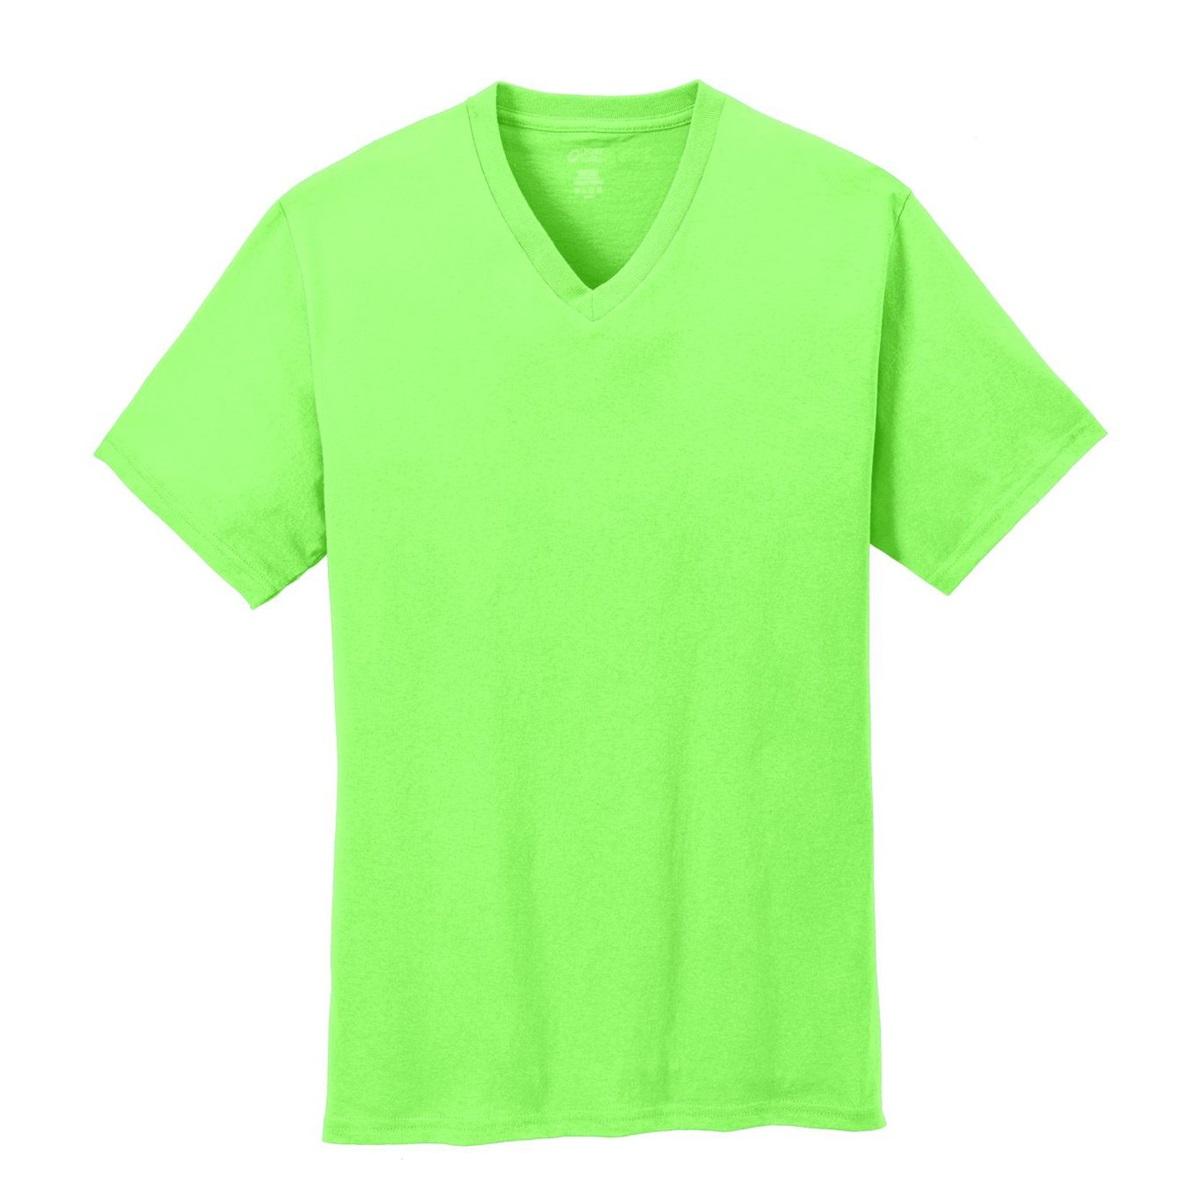 Port & Company PC54V 5.4-oz Cotton V-Neck T-Shirt - Neon ...